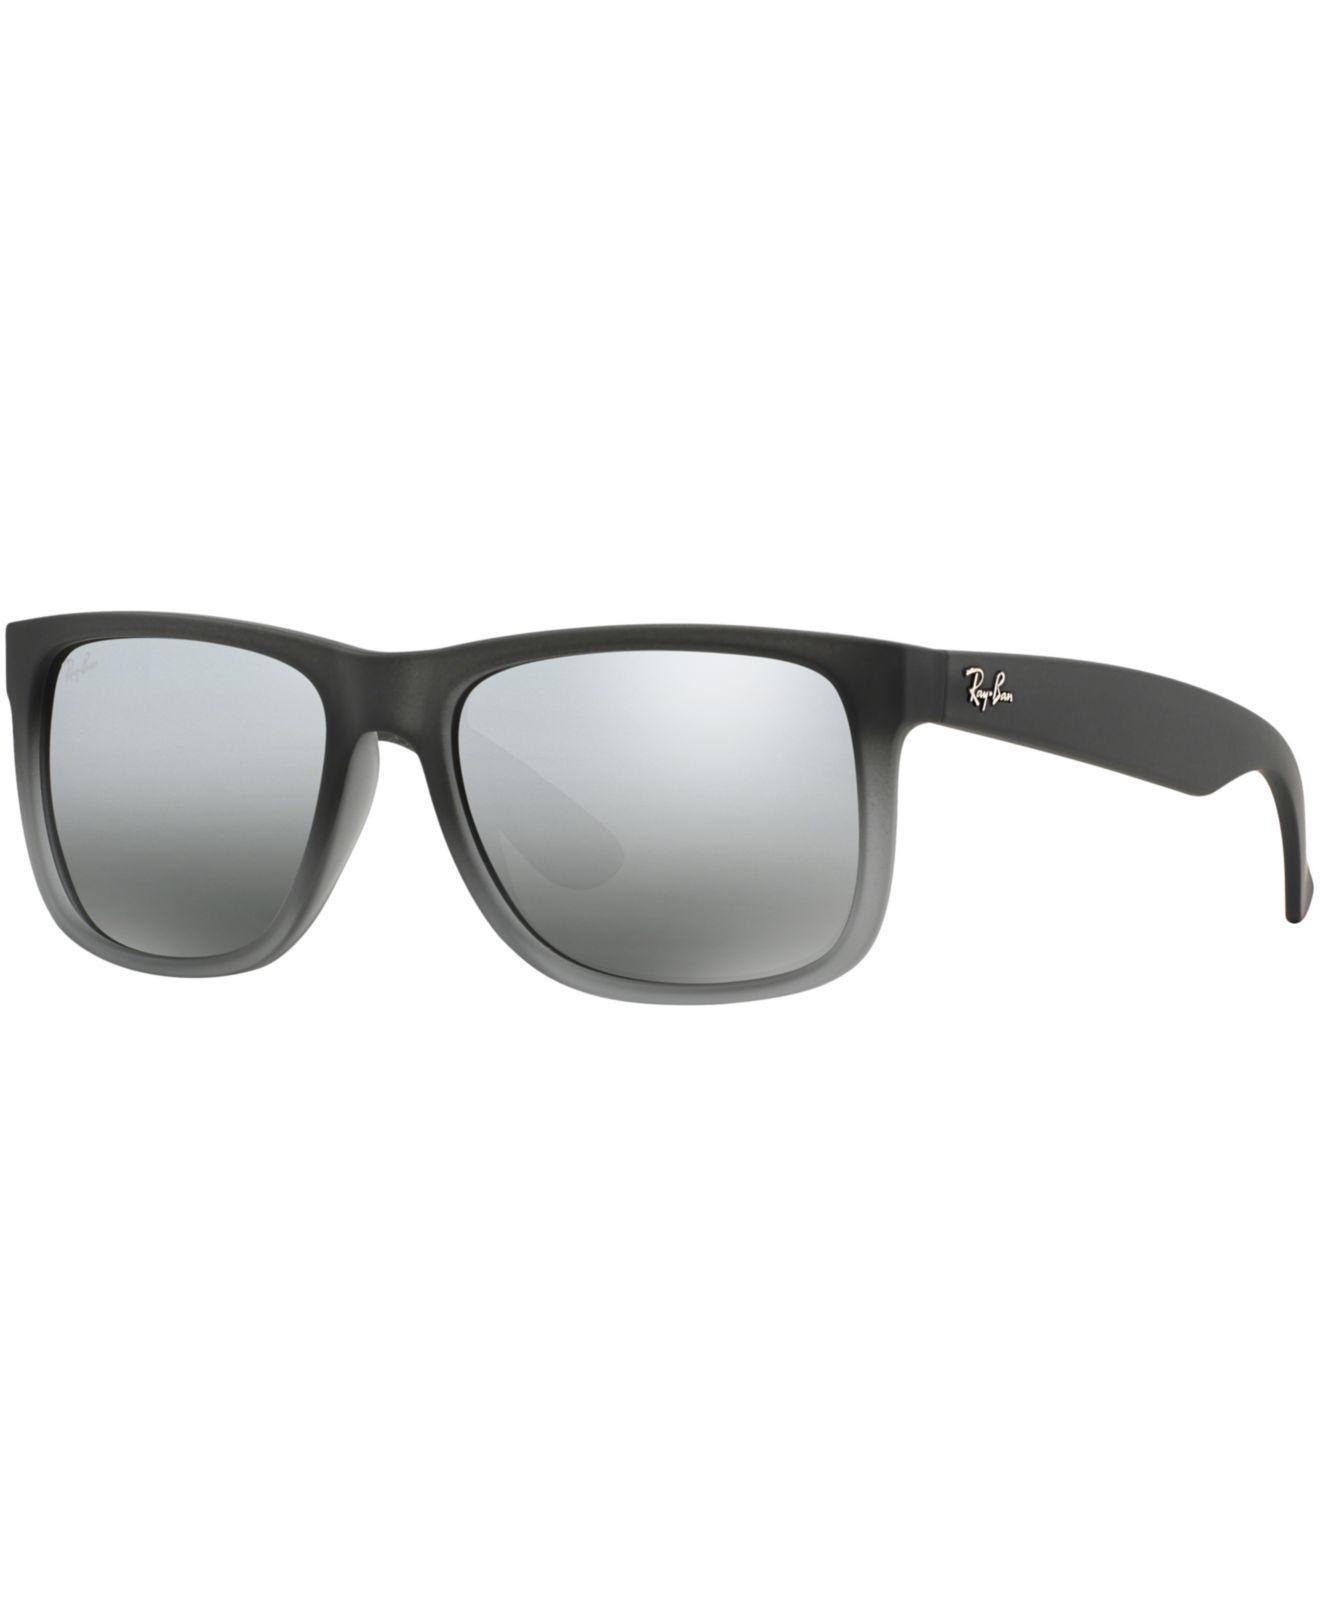 4405eed70b0 Ray-Ban. Women s Gray Sunglasses ...